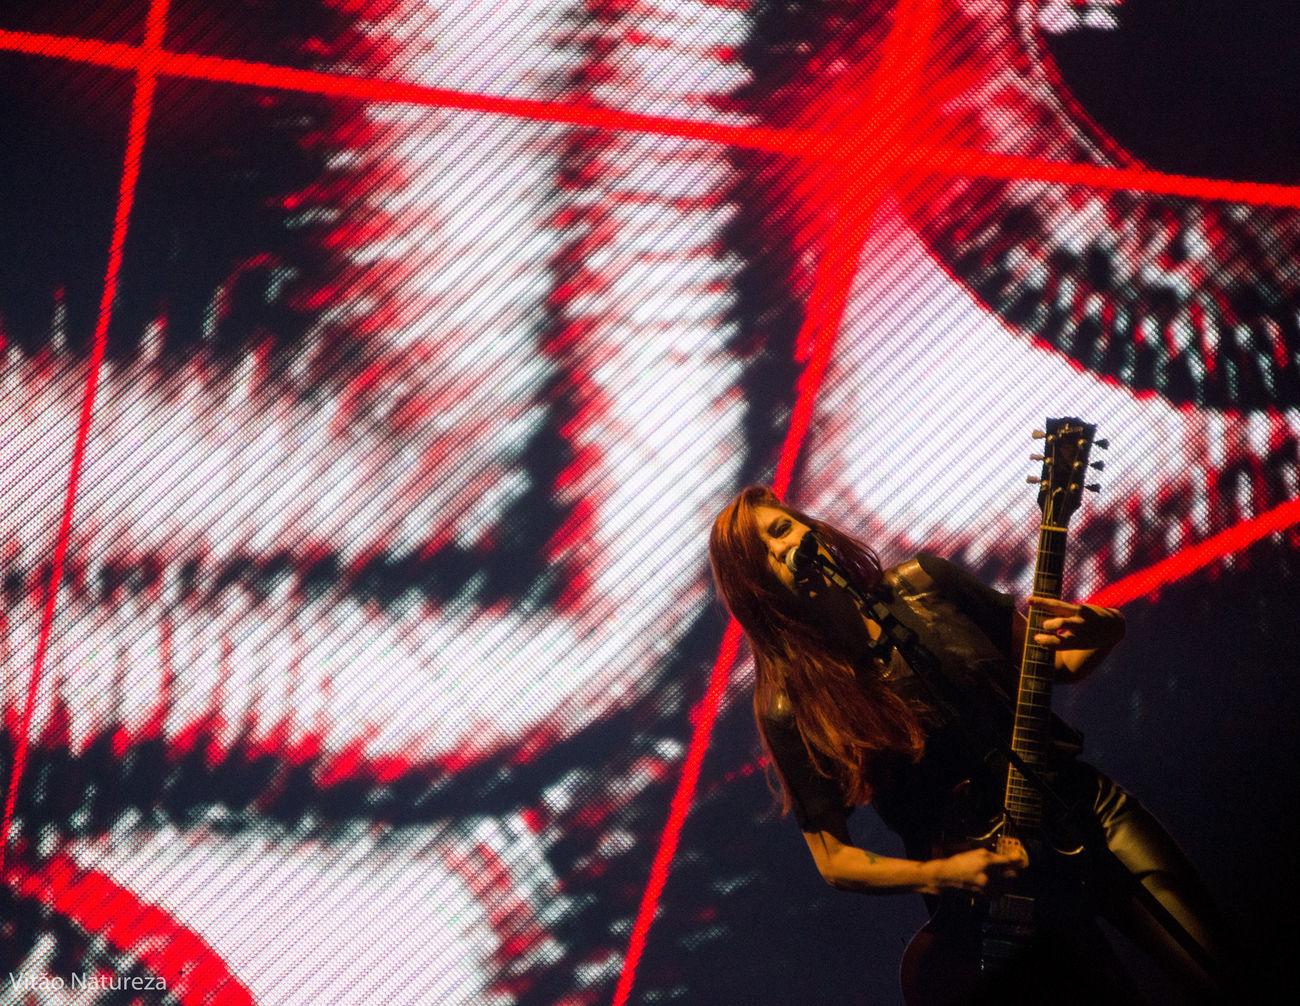 Streetphotography Olharnatural Vitaonatureza Victornatureza Planetarock Show Rocknacional Musica Rock Pitty